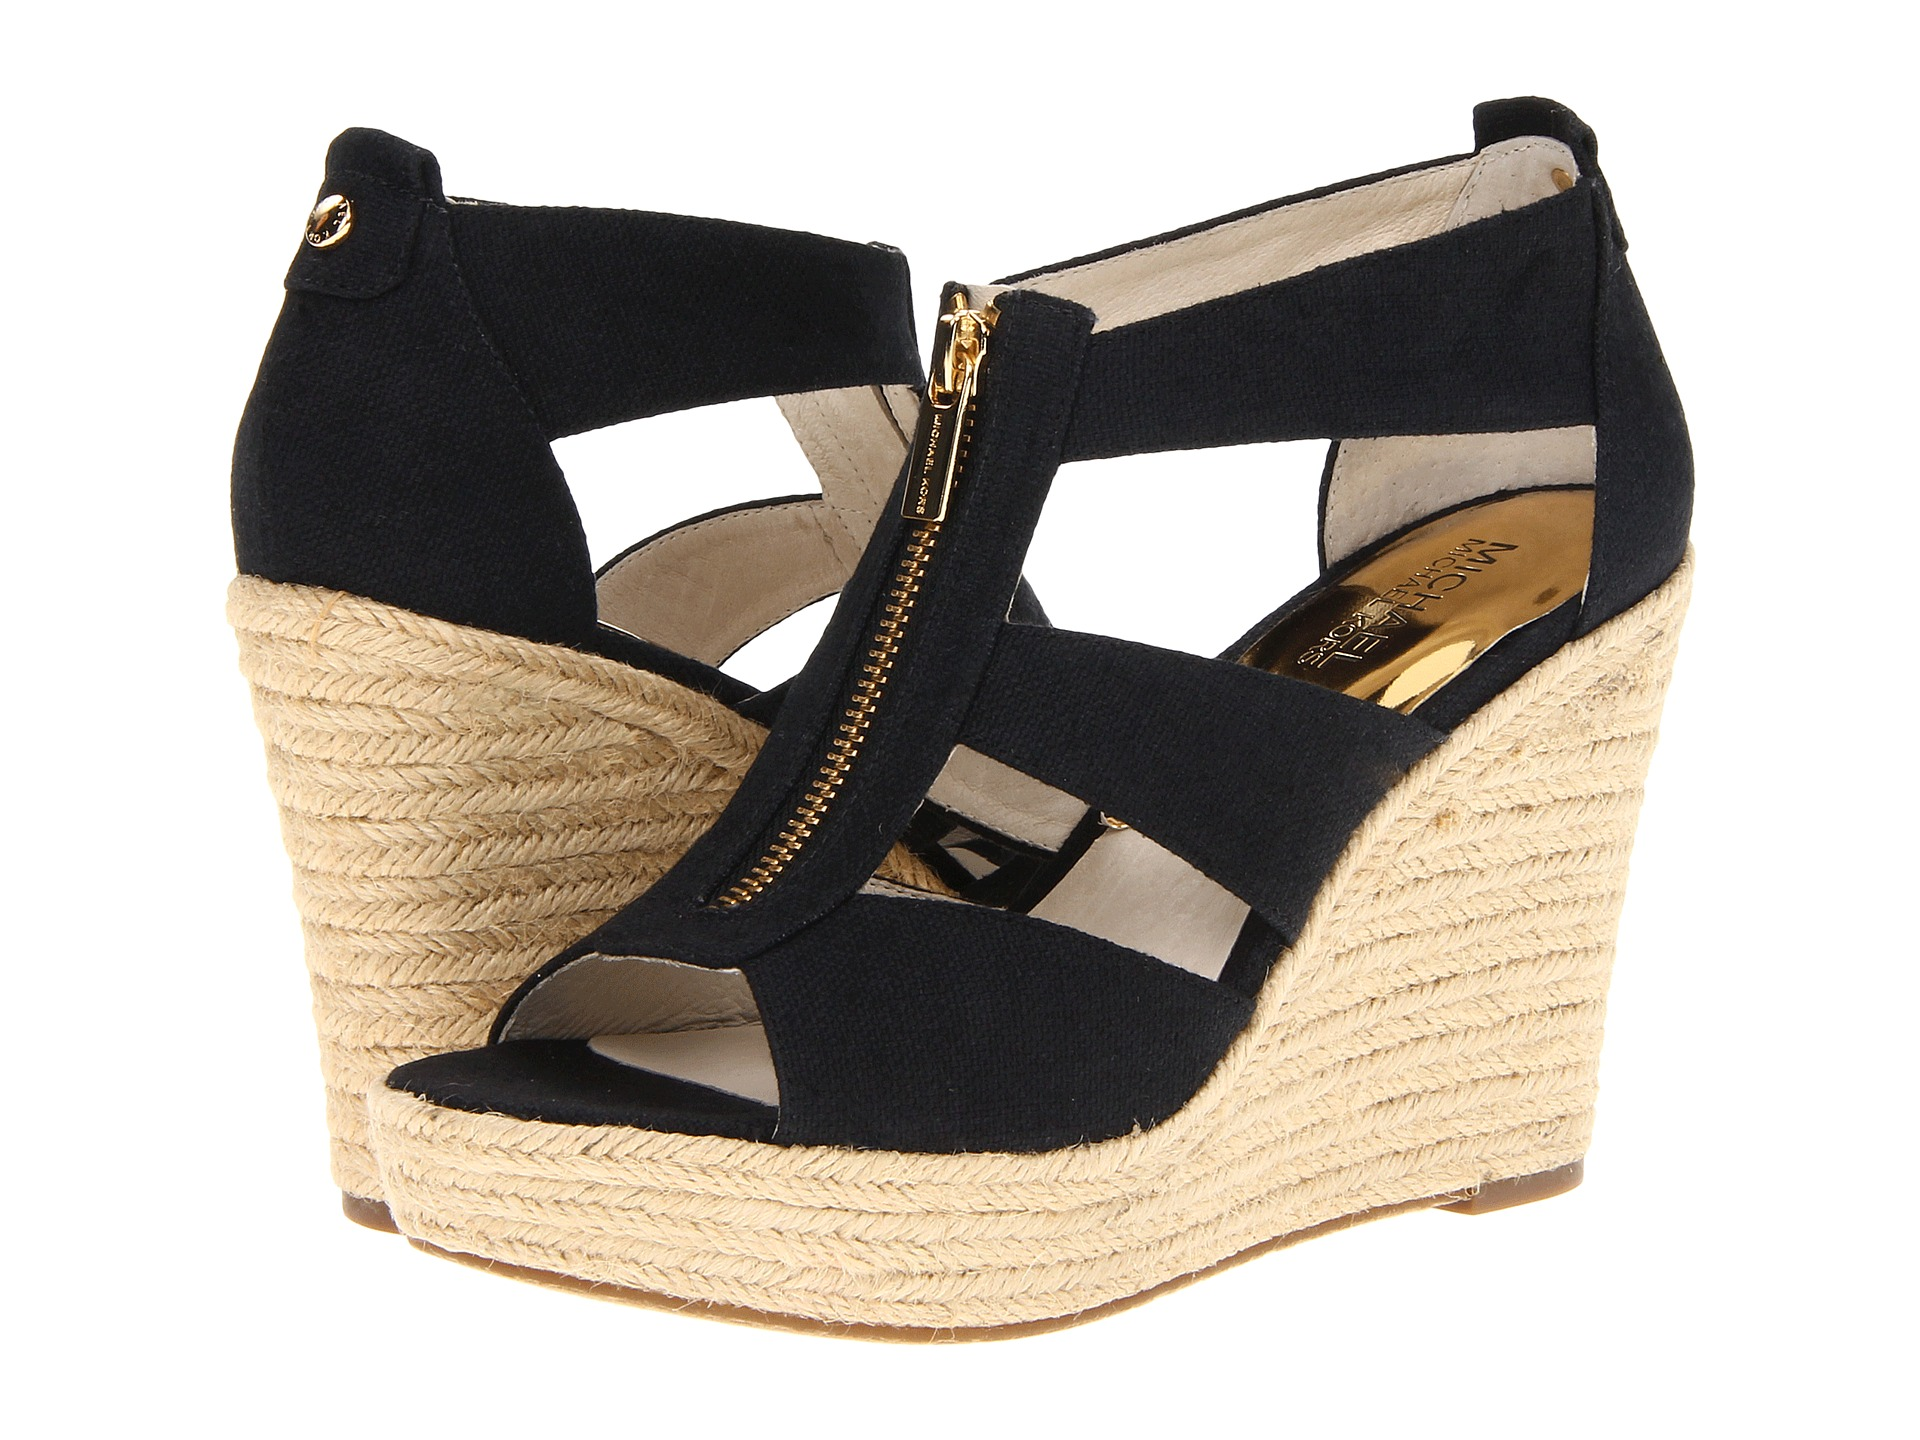 Black sandals michael kors - Black Sandals Michael Kors 4